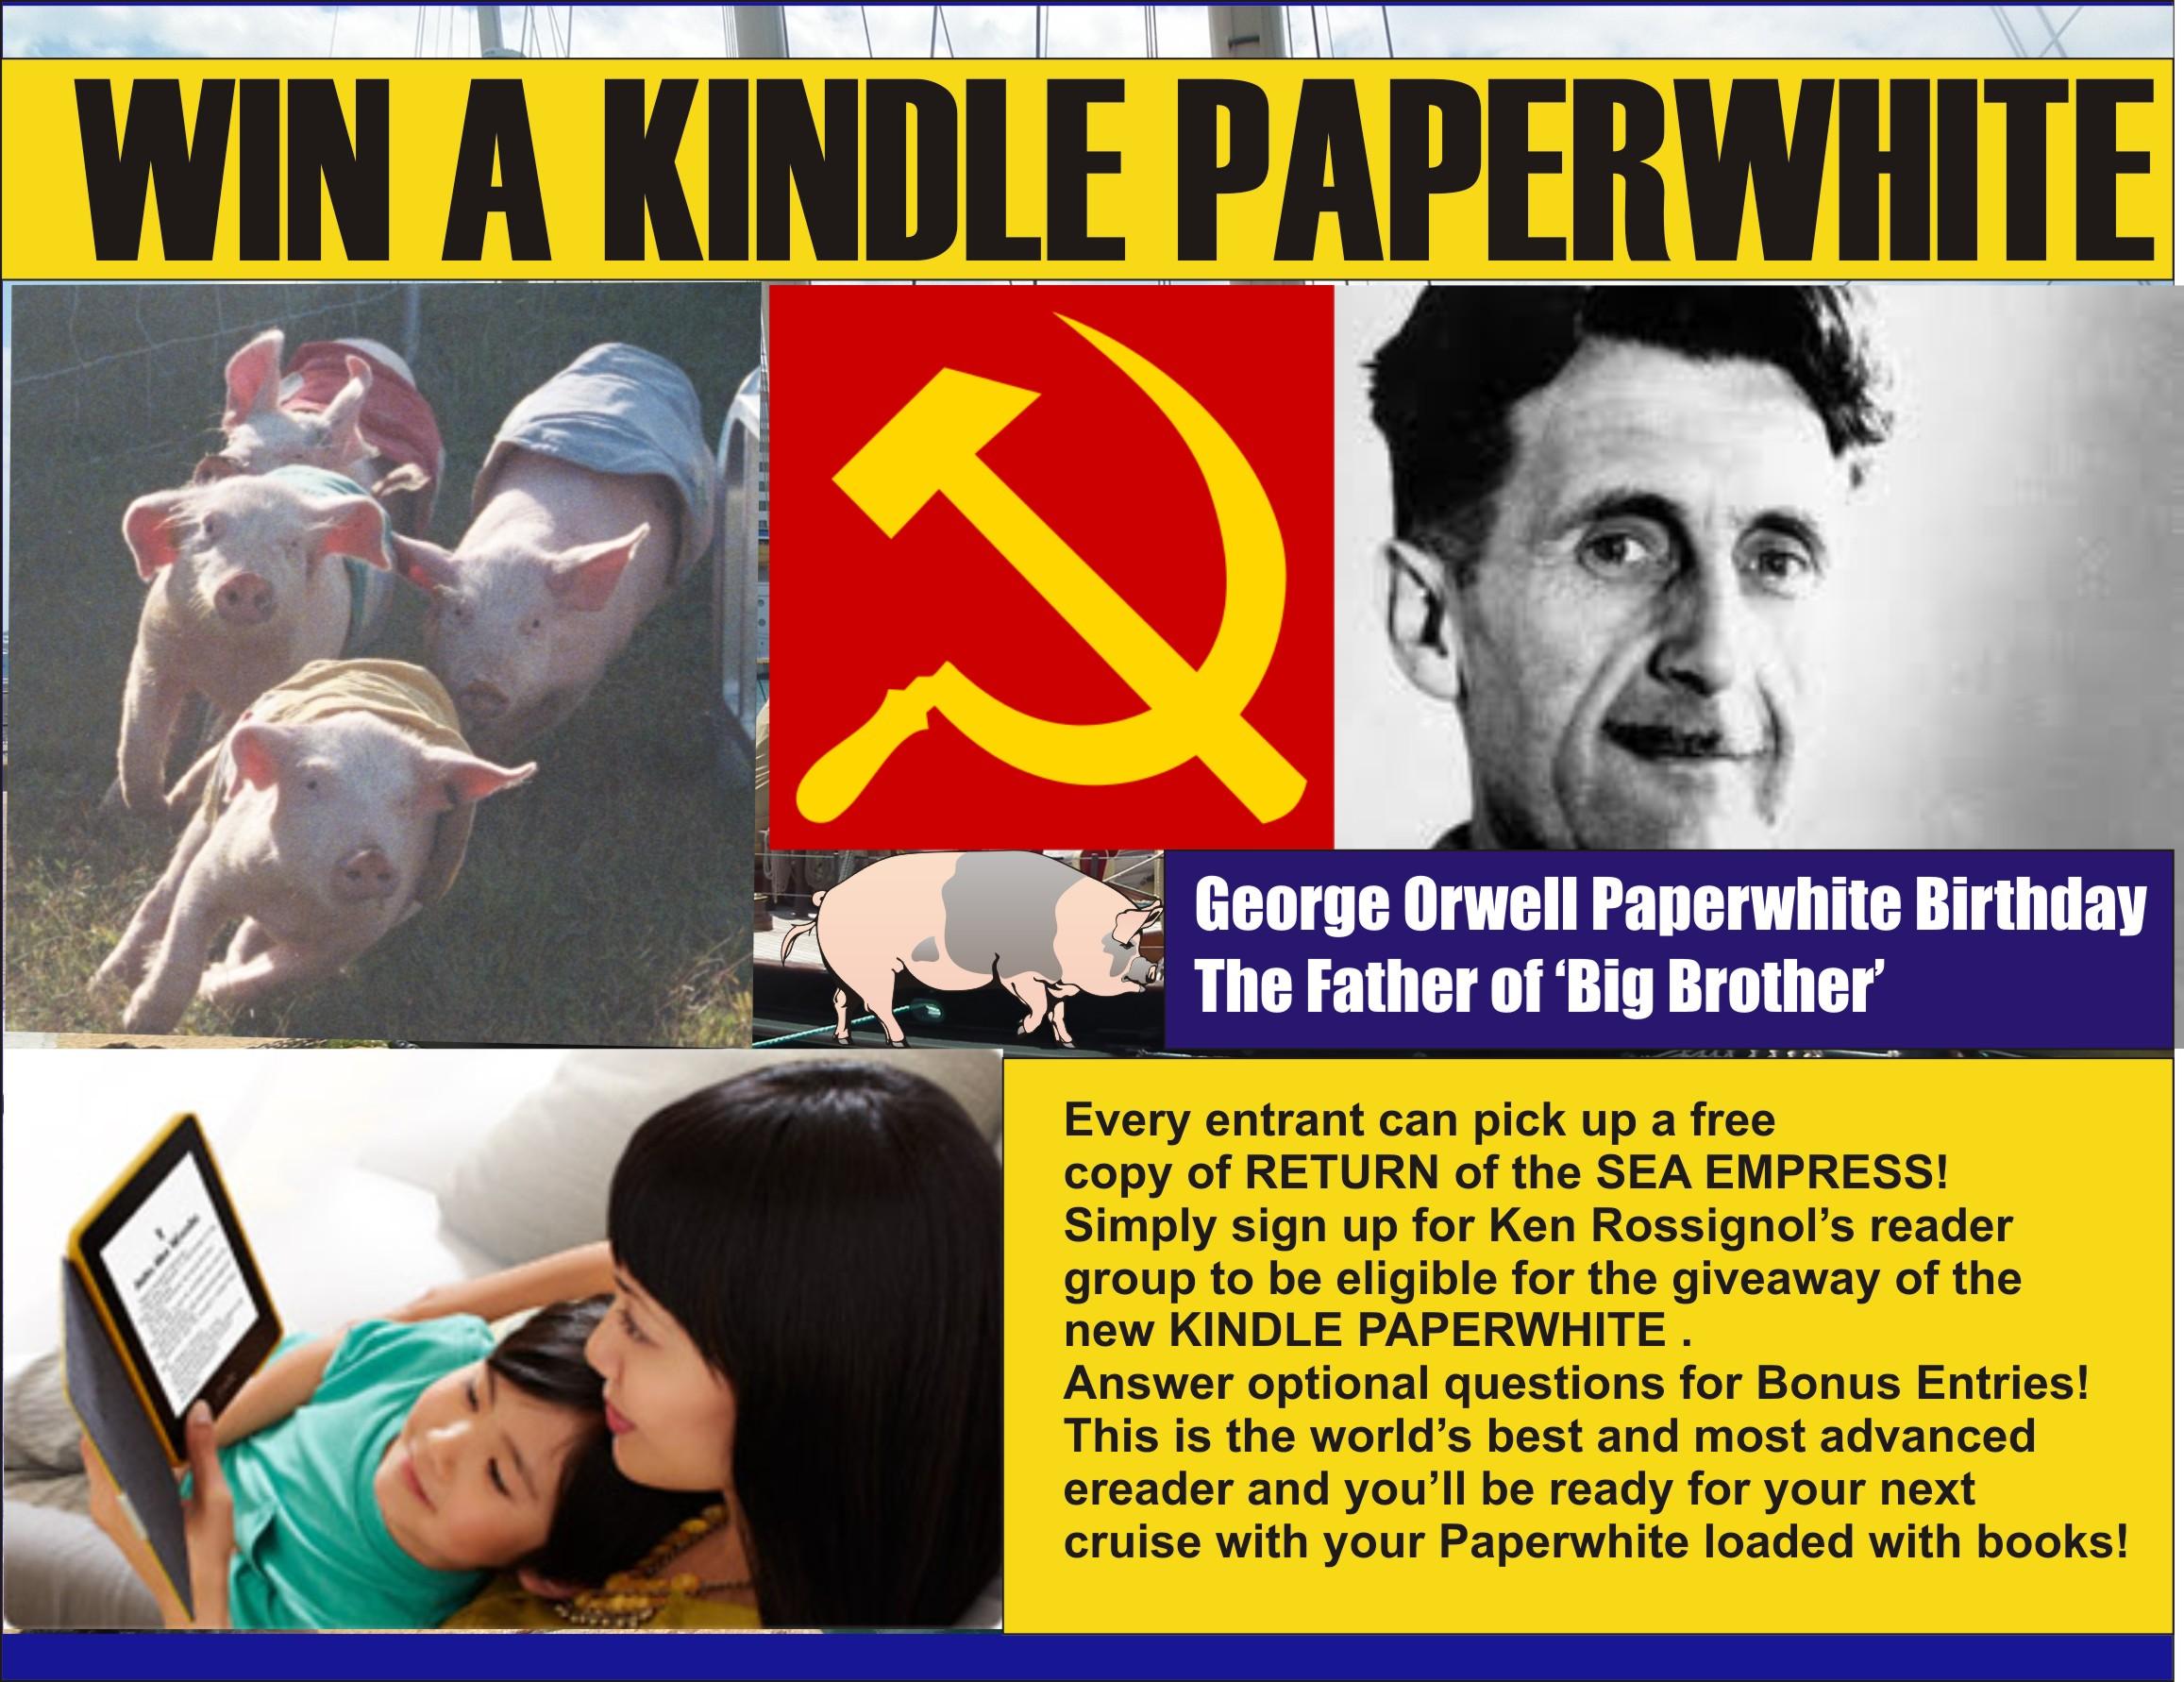 Orwell Paperwhite